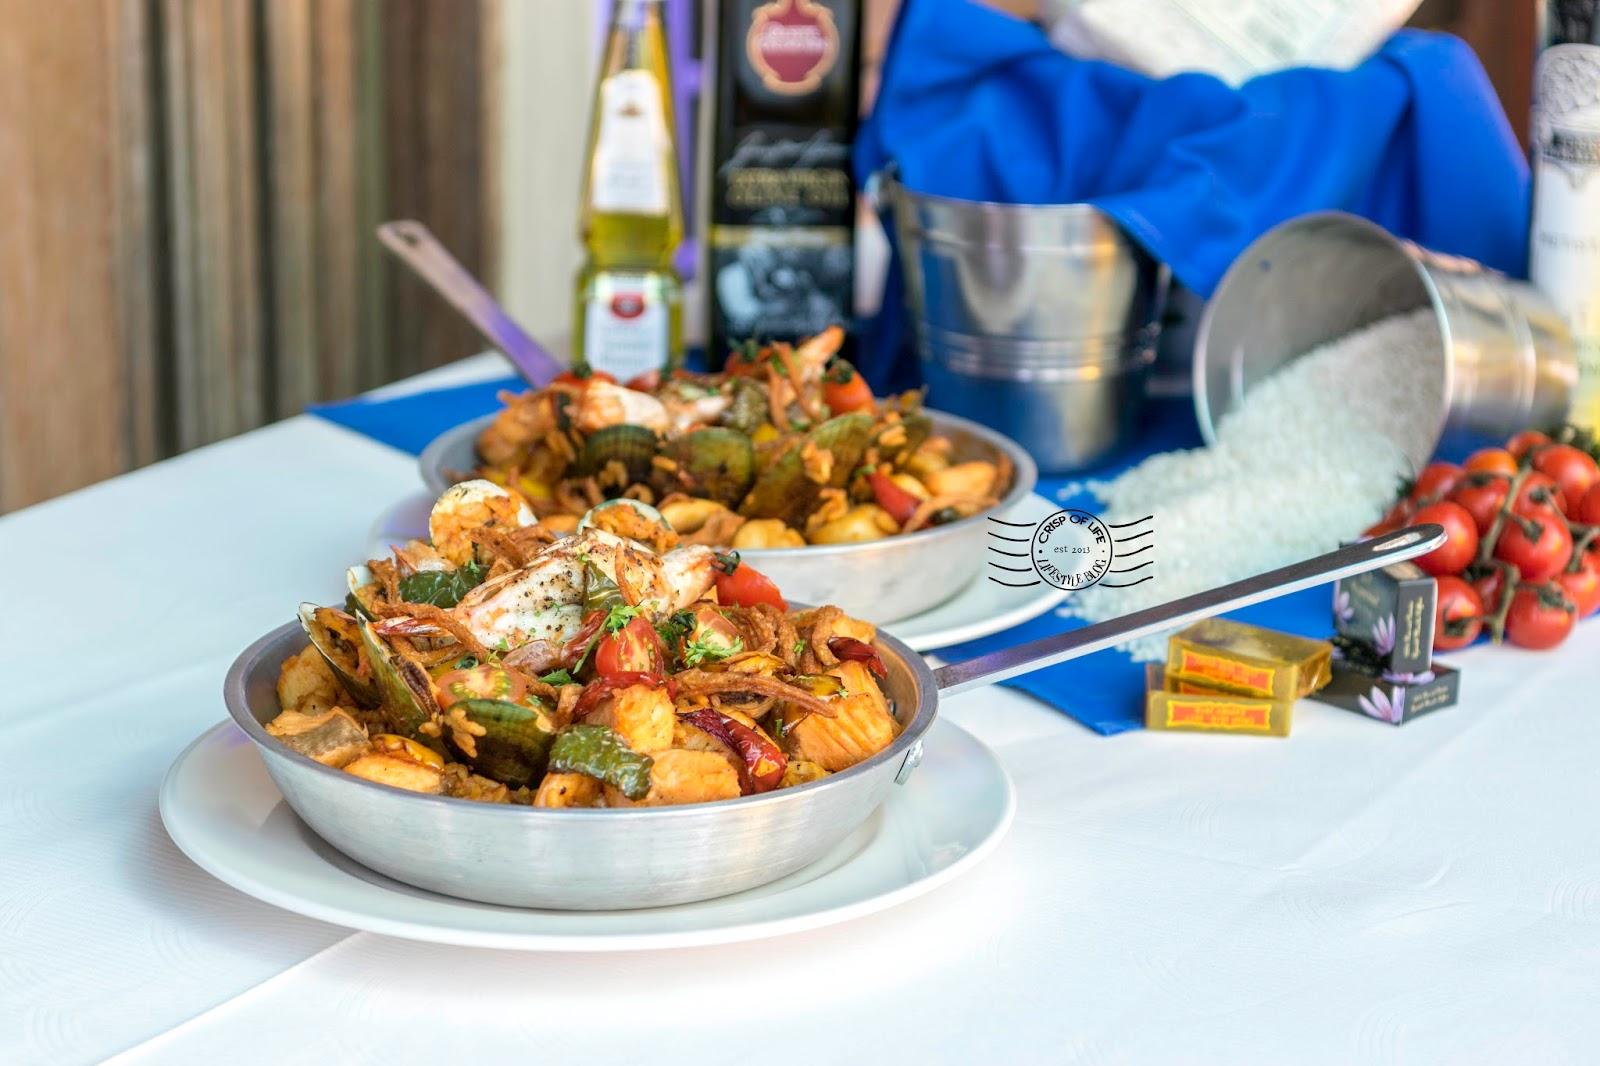 Seafood Paella & Mama-mia Pizza @ Sigi's Bar and Grill, Golden Sands Resort Penang by Shangri-La